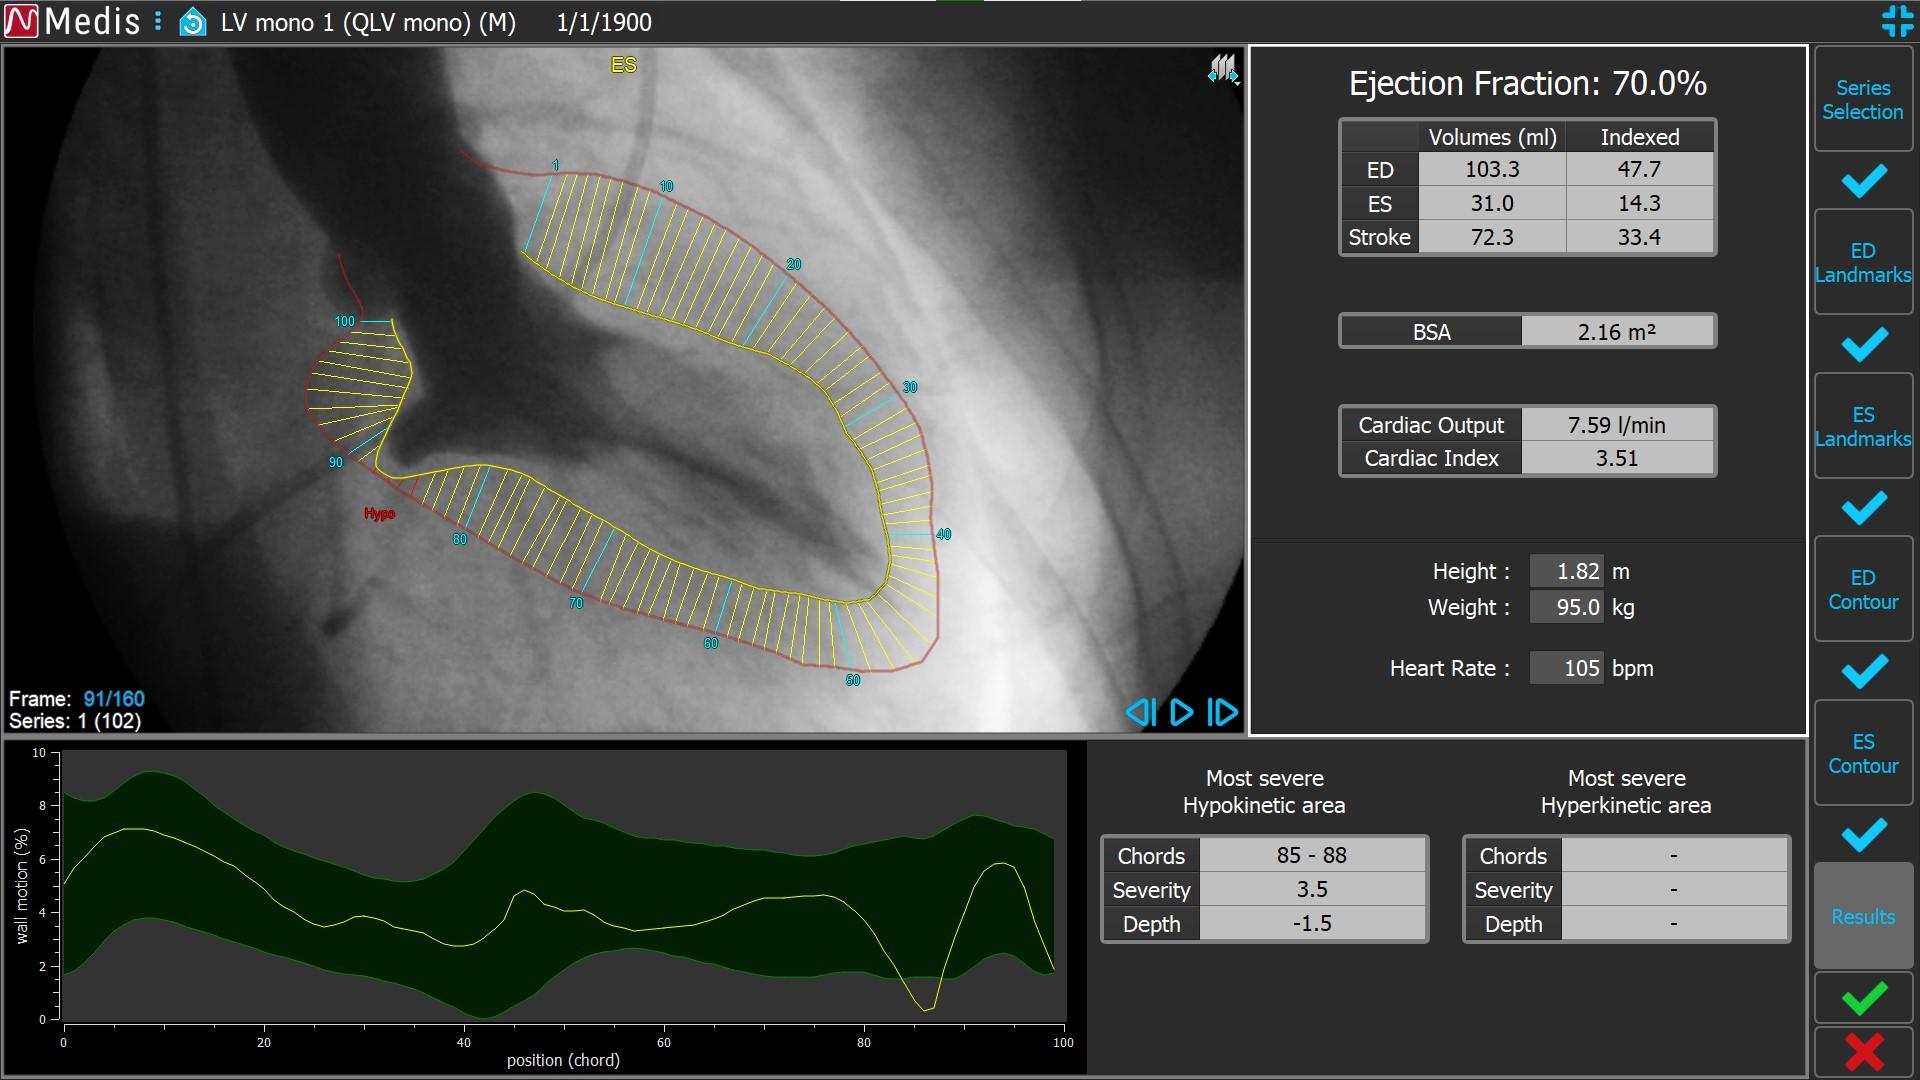 Medis Suite XA LV Monoplane 6 Results